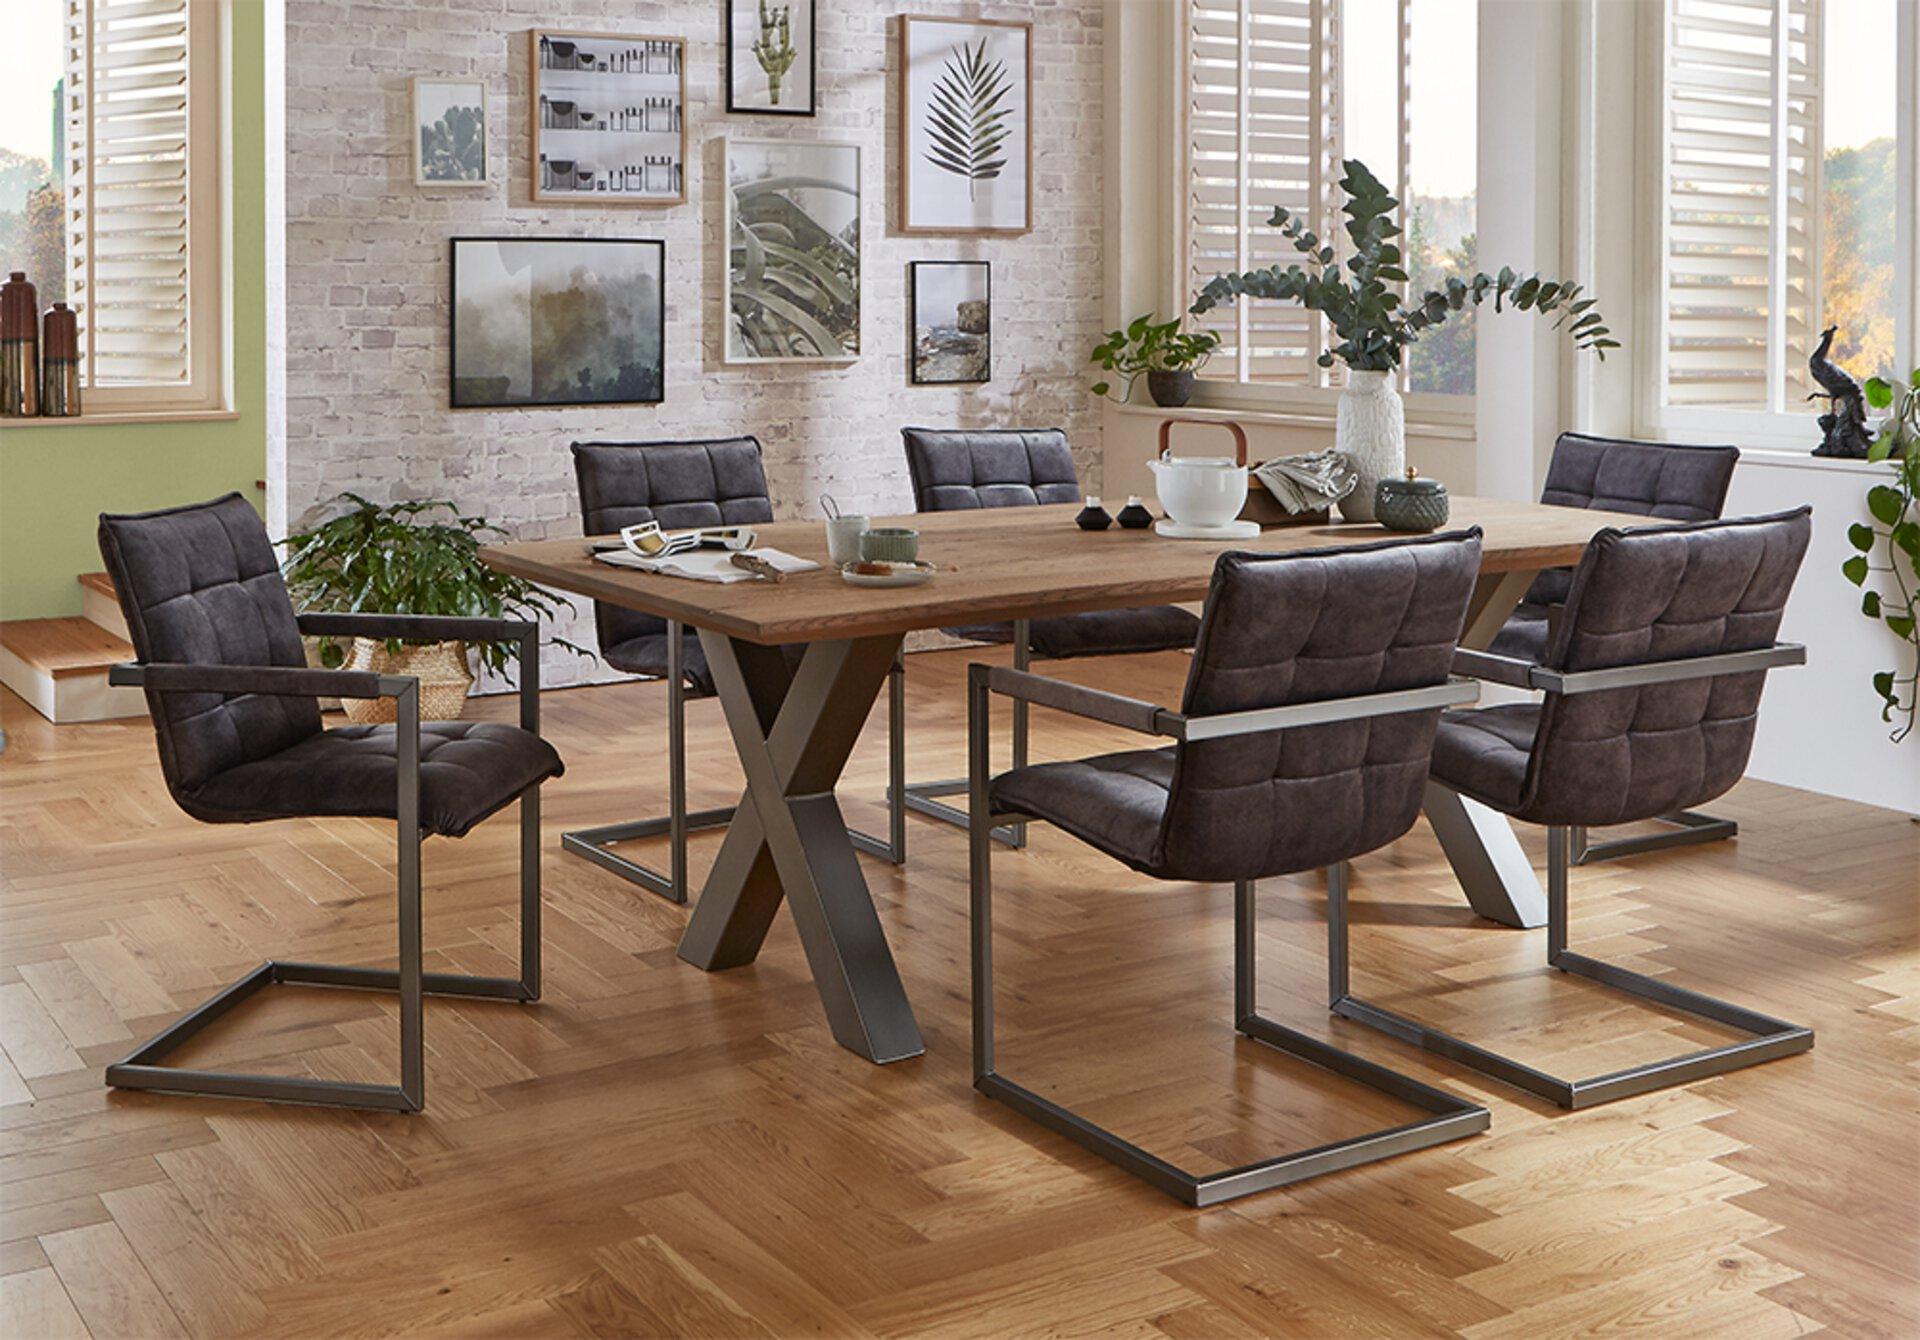 Stuhl CAPPO VALMONDO Textil mehrfarbig 63 x 87 x 56 cm